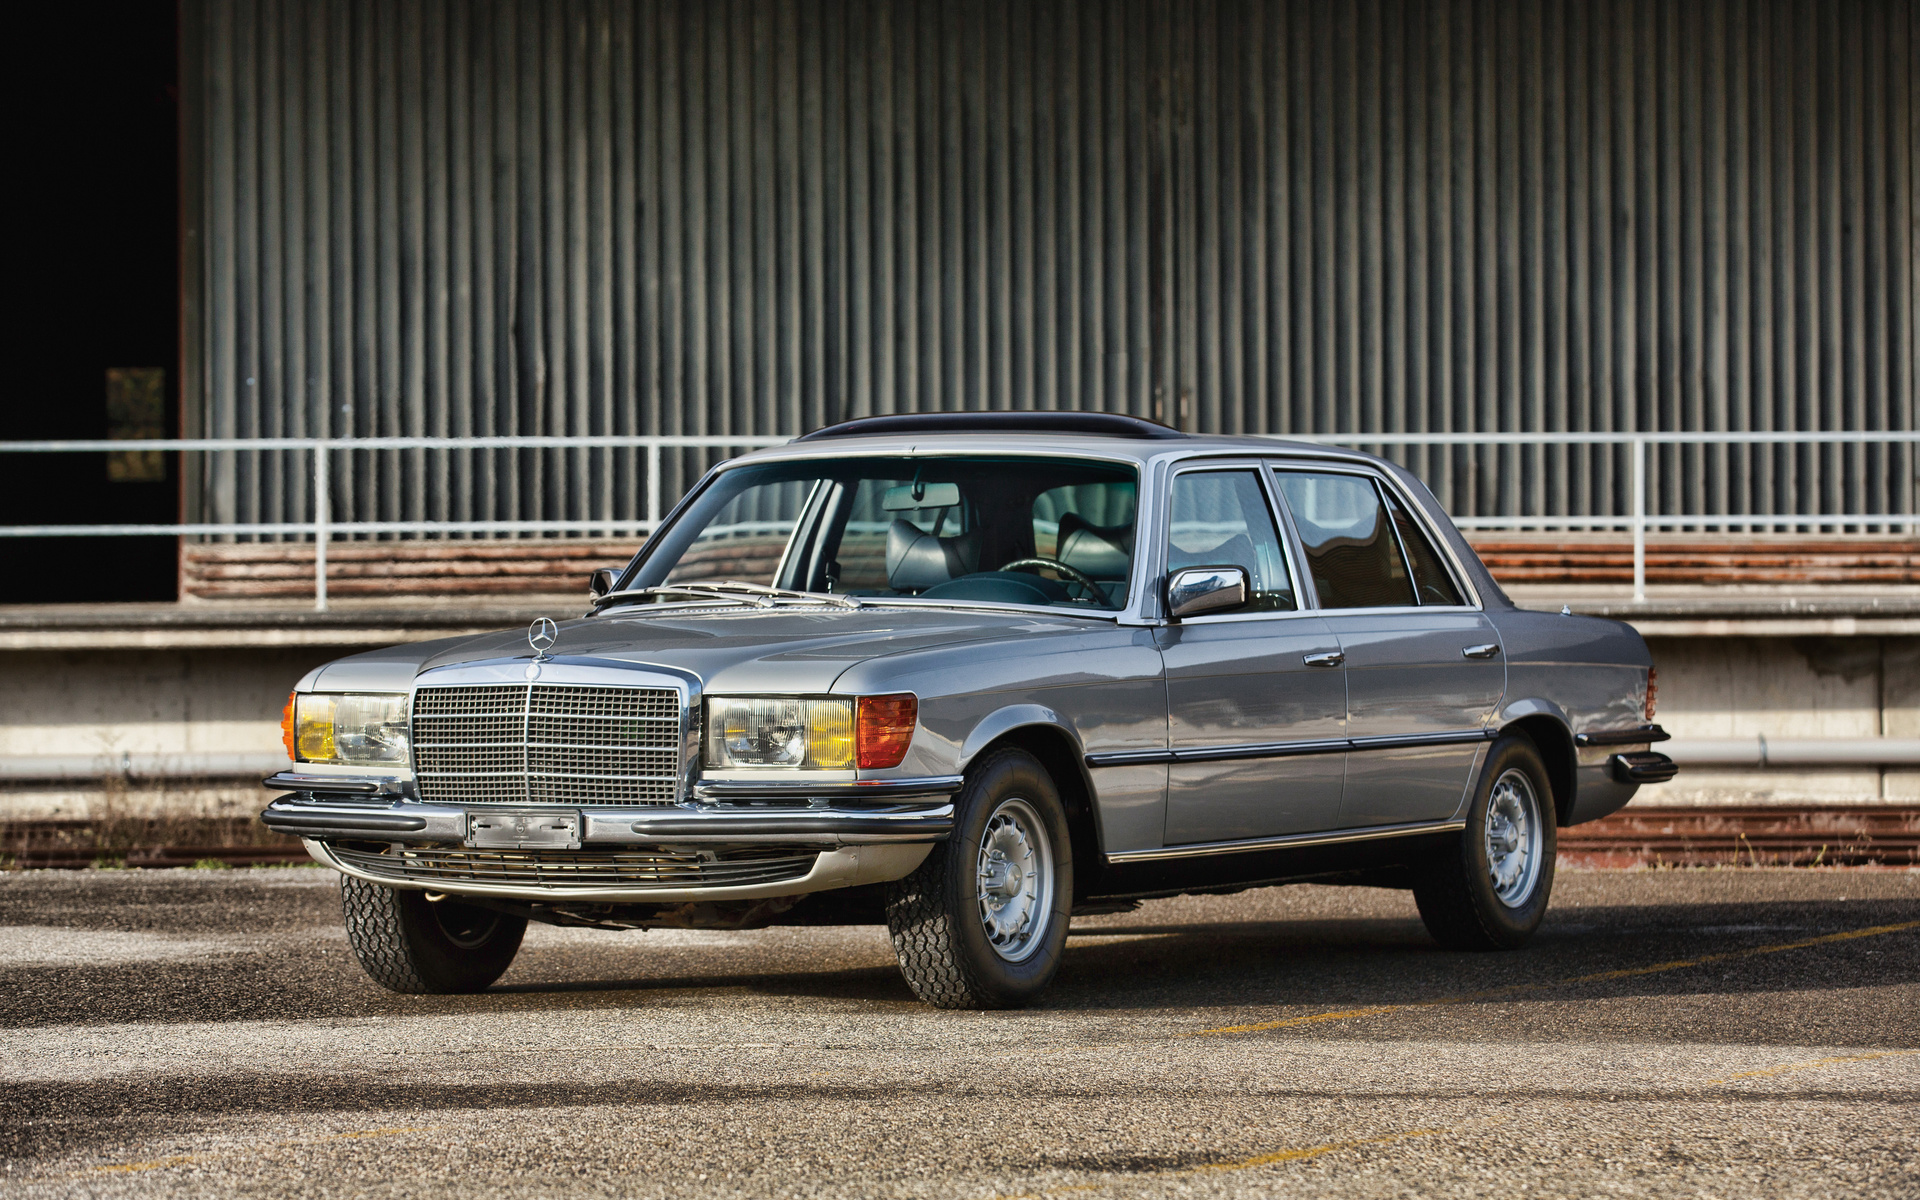 mercedes-benz 450 sel, 4k, retro cars, 1980 cars, w116, luxury cars, 1980 mercedes-benz 450 sel, german cars, mercedes